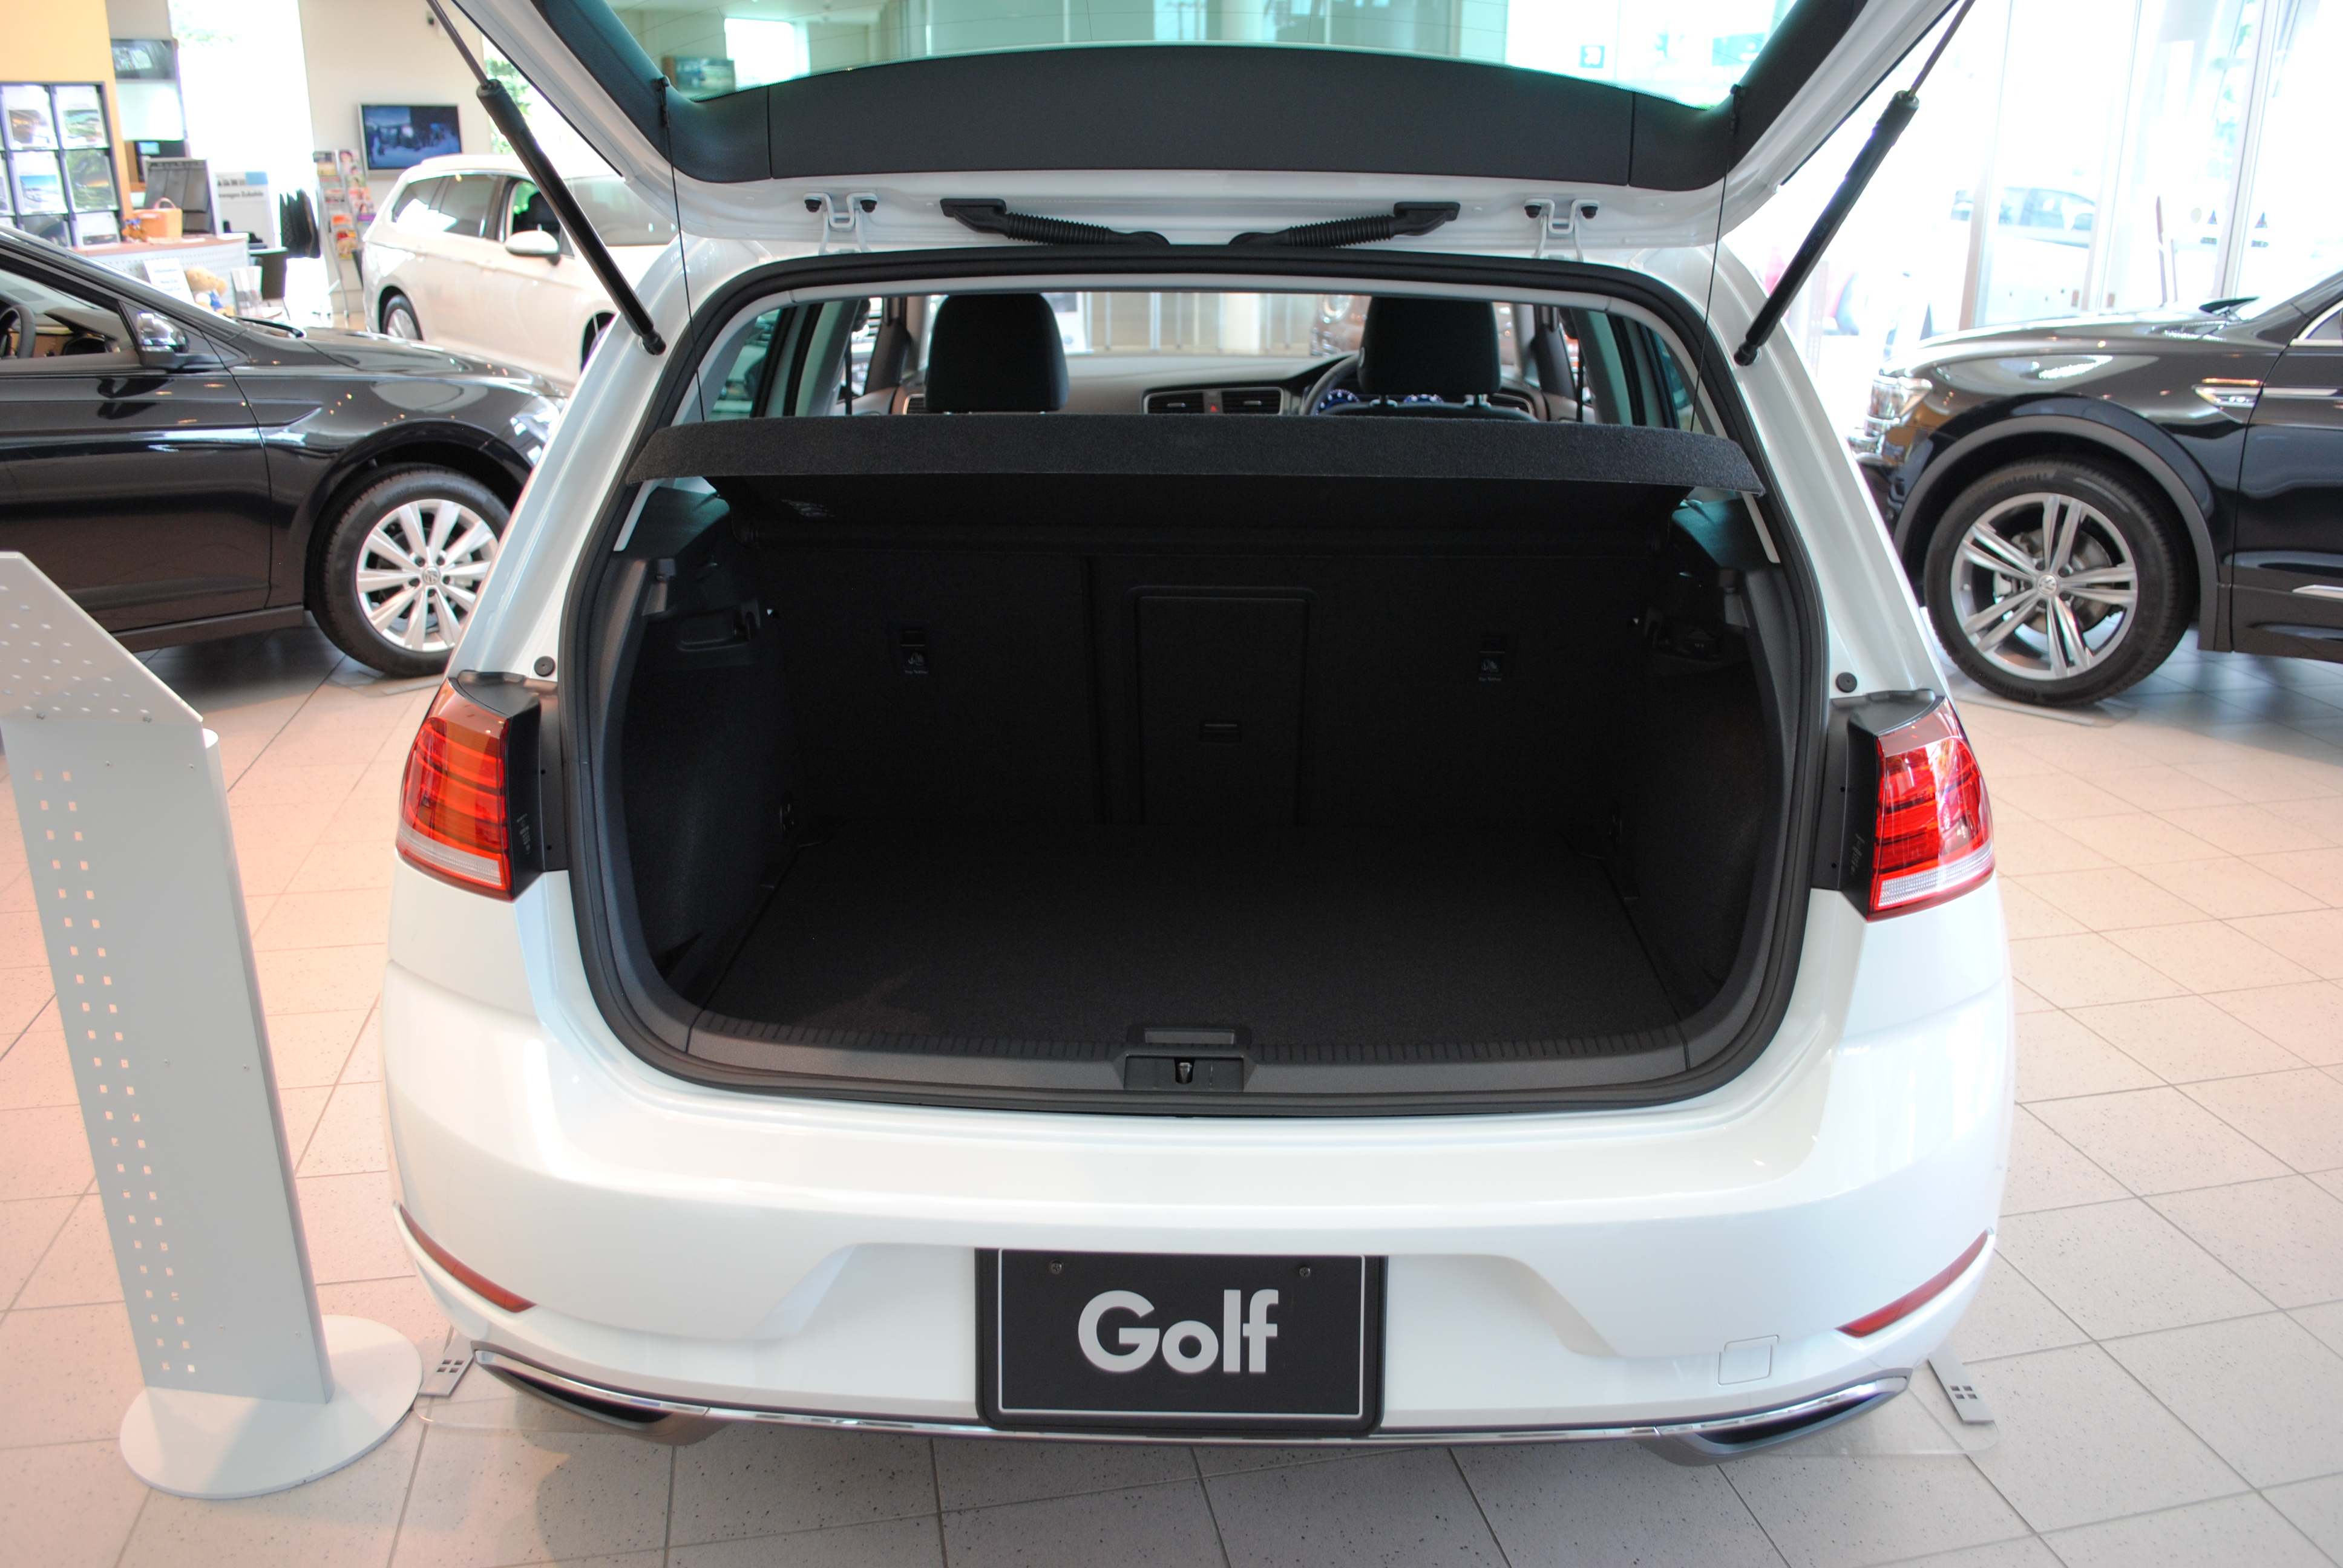 New Golf TSI Comfortline Tech Editionの画像3